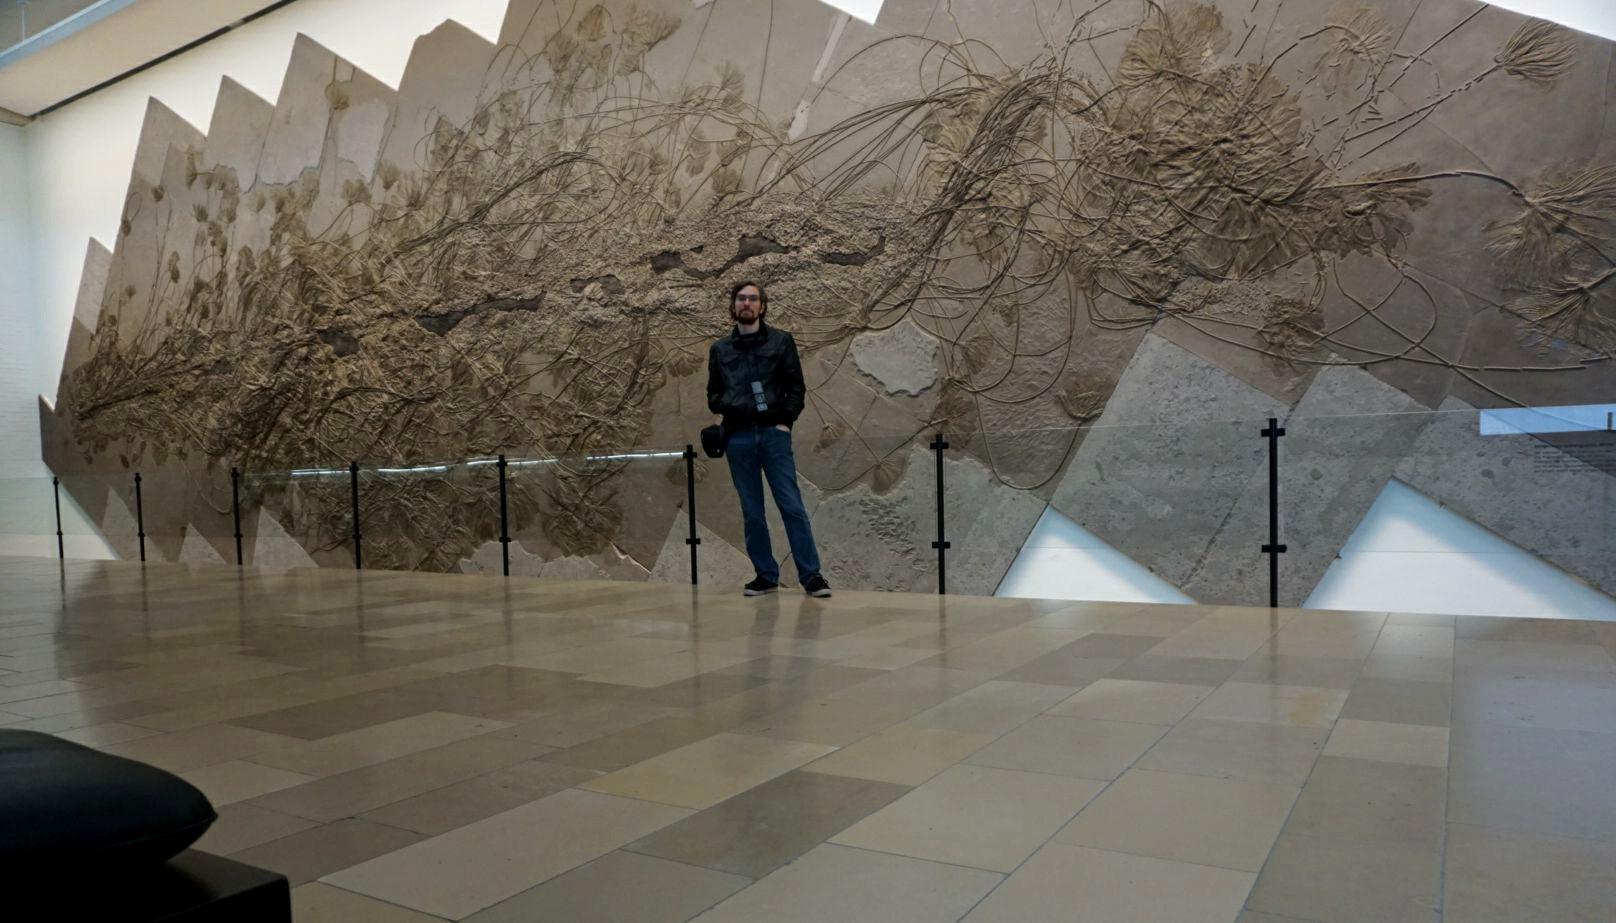 Urweltmuseum hauff